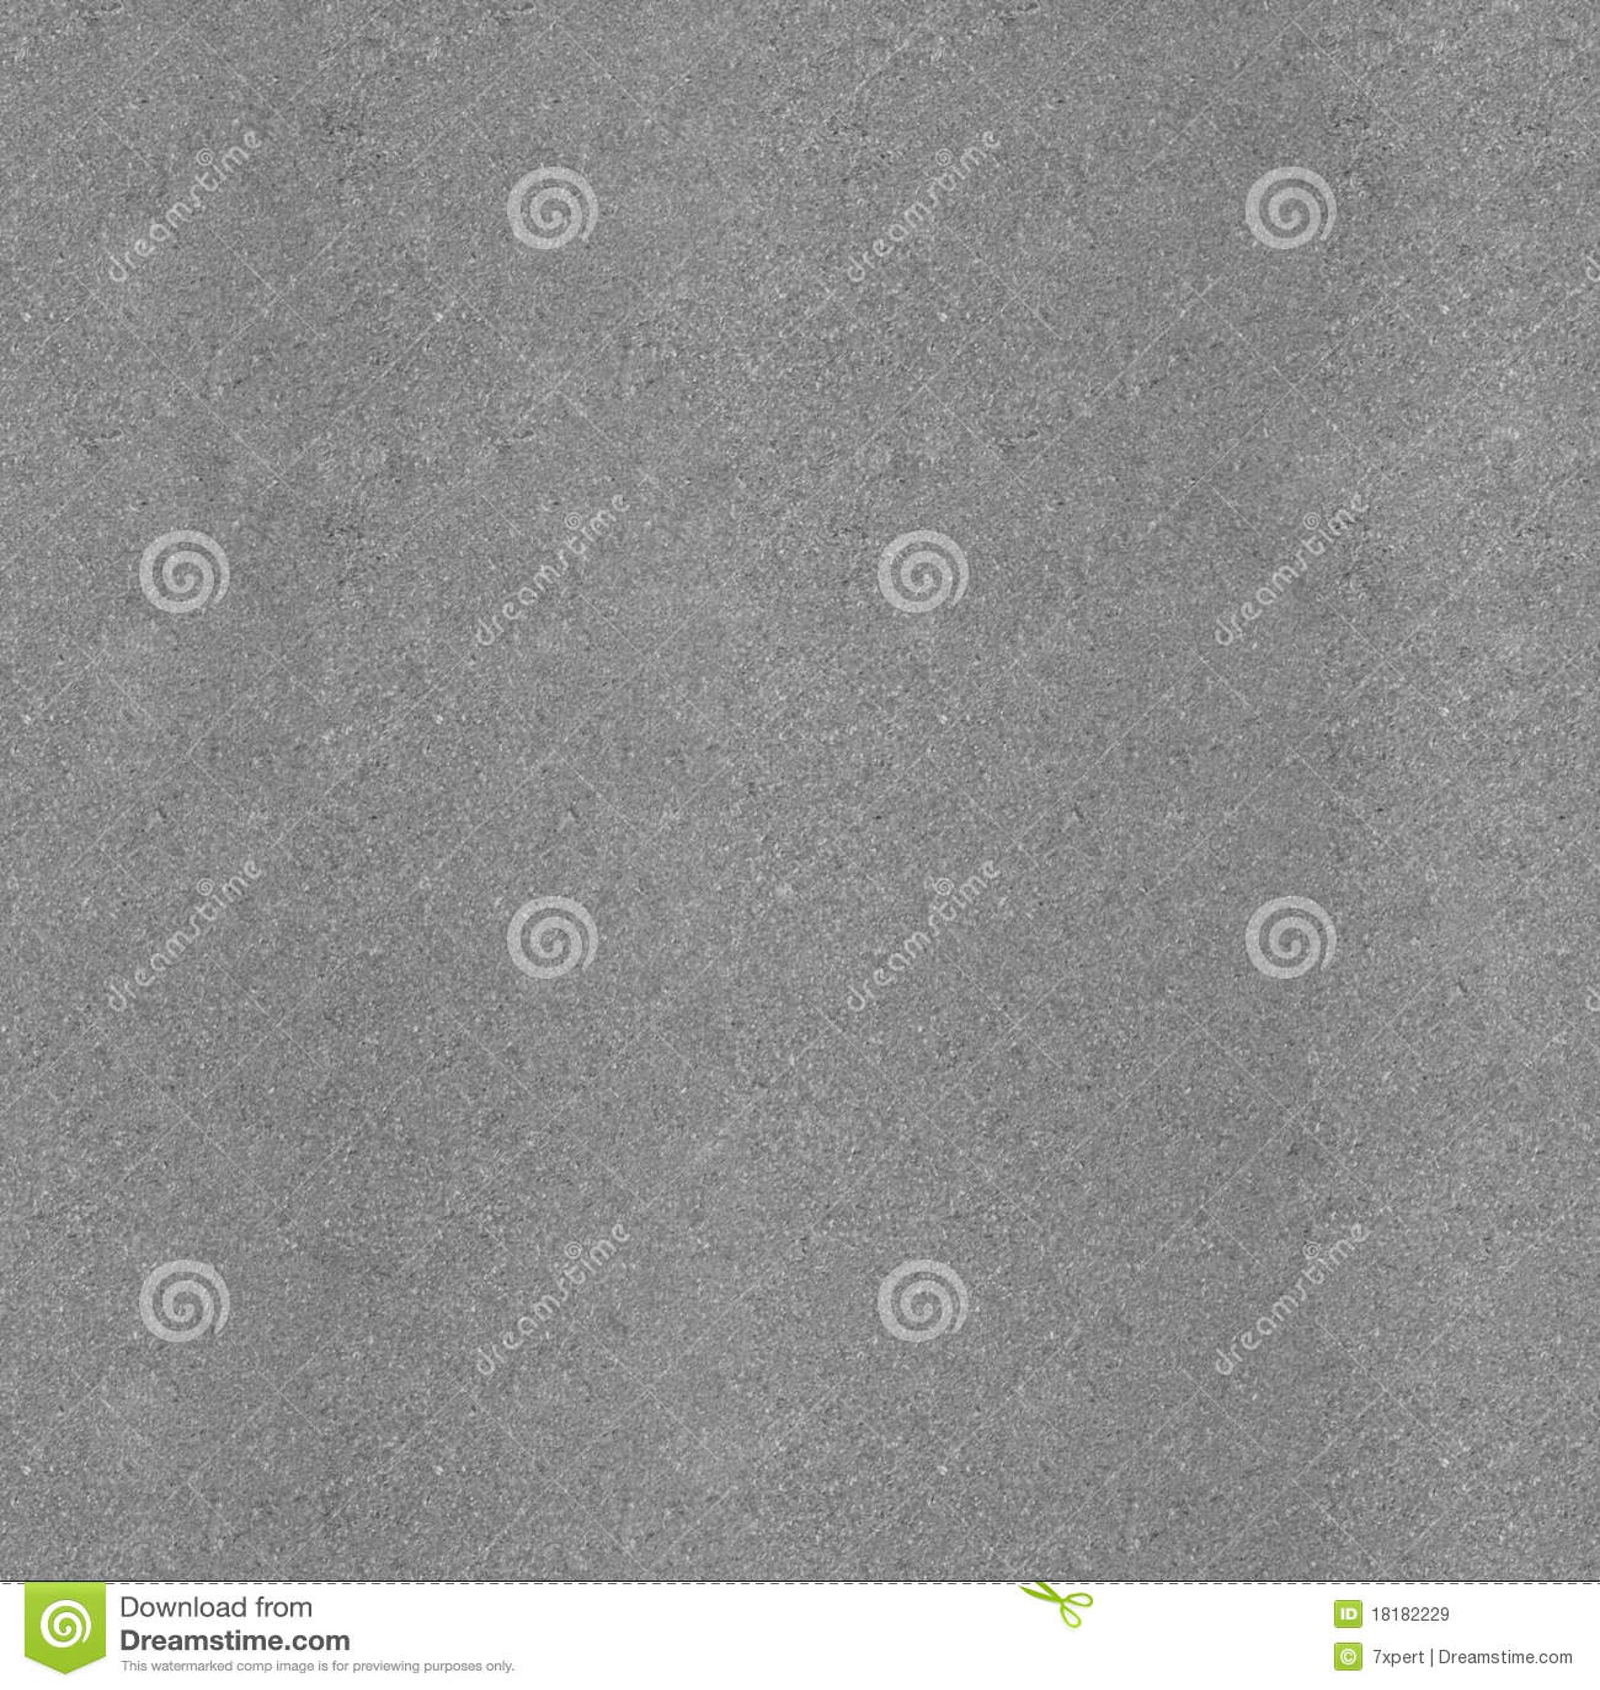 Seamless Asphalt Road Stock Image Image Of Textured